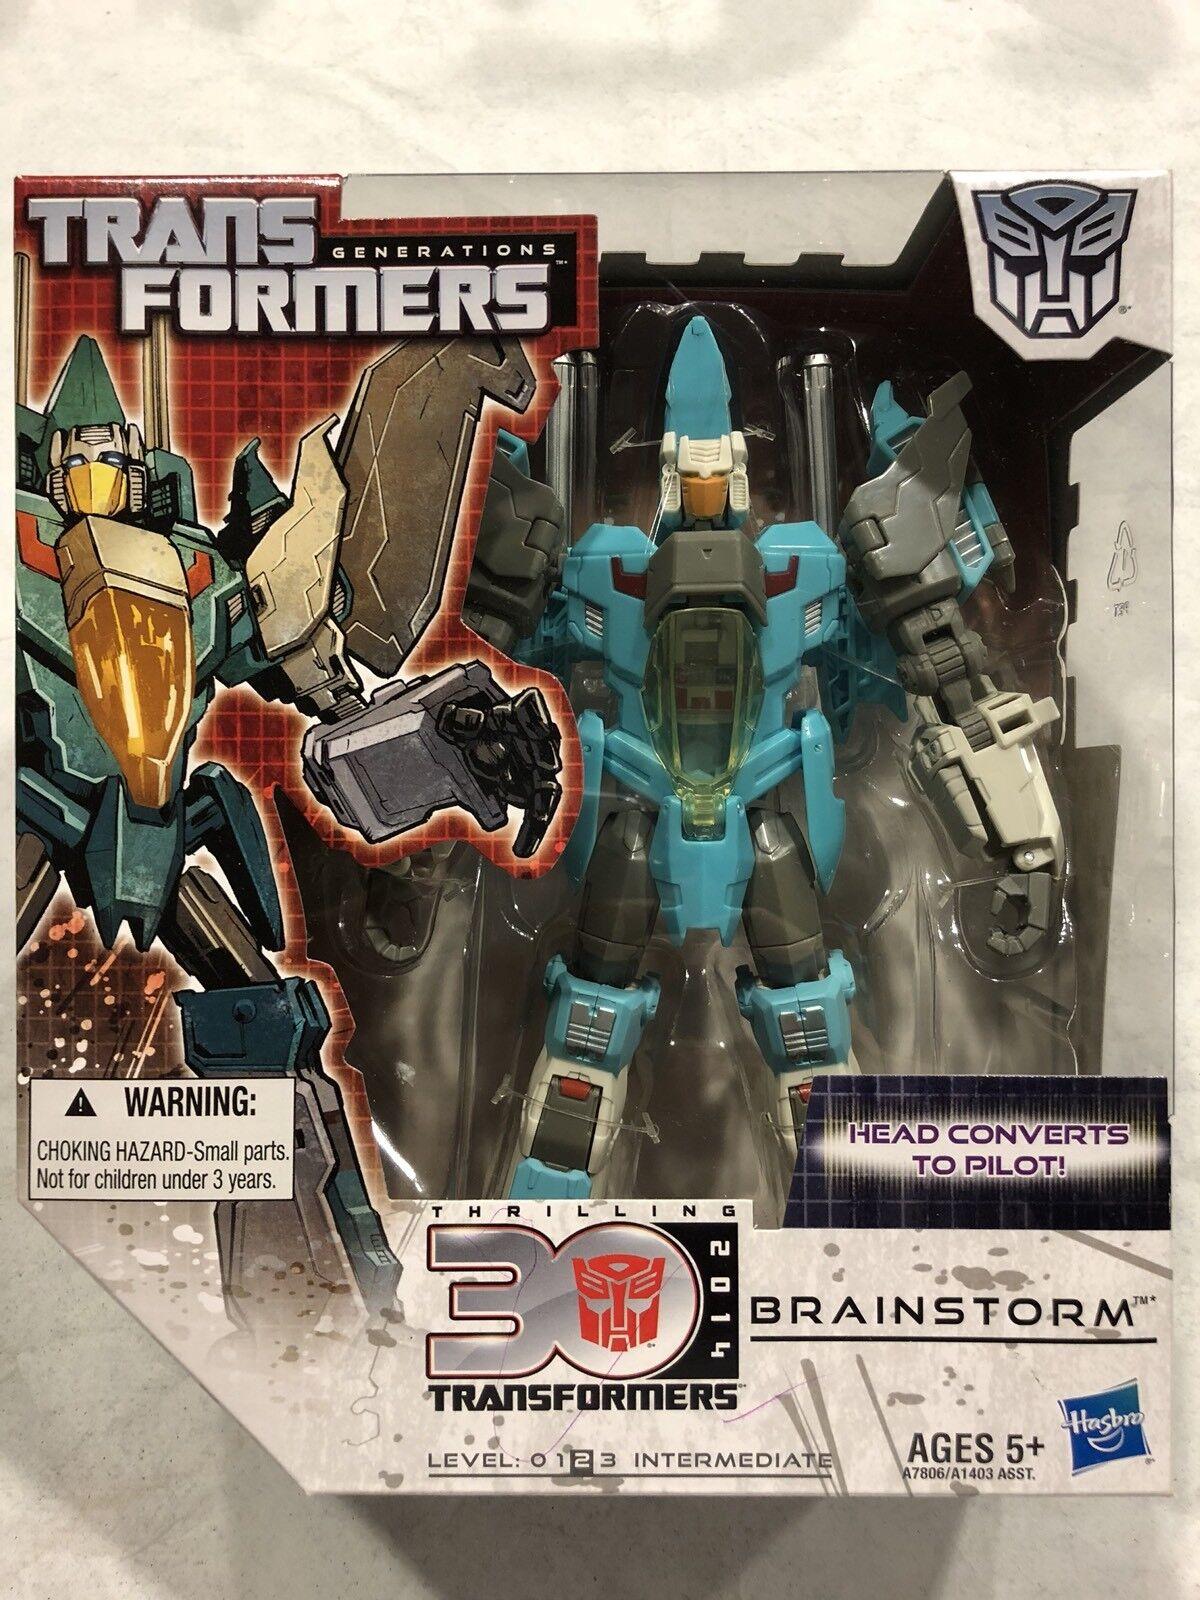 Hasbro Transformers G1  Generations Voyager Brainstorm 30th Anniversary MISB  beaucoup de surprises